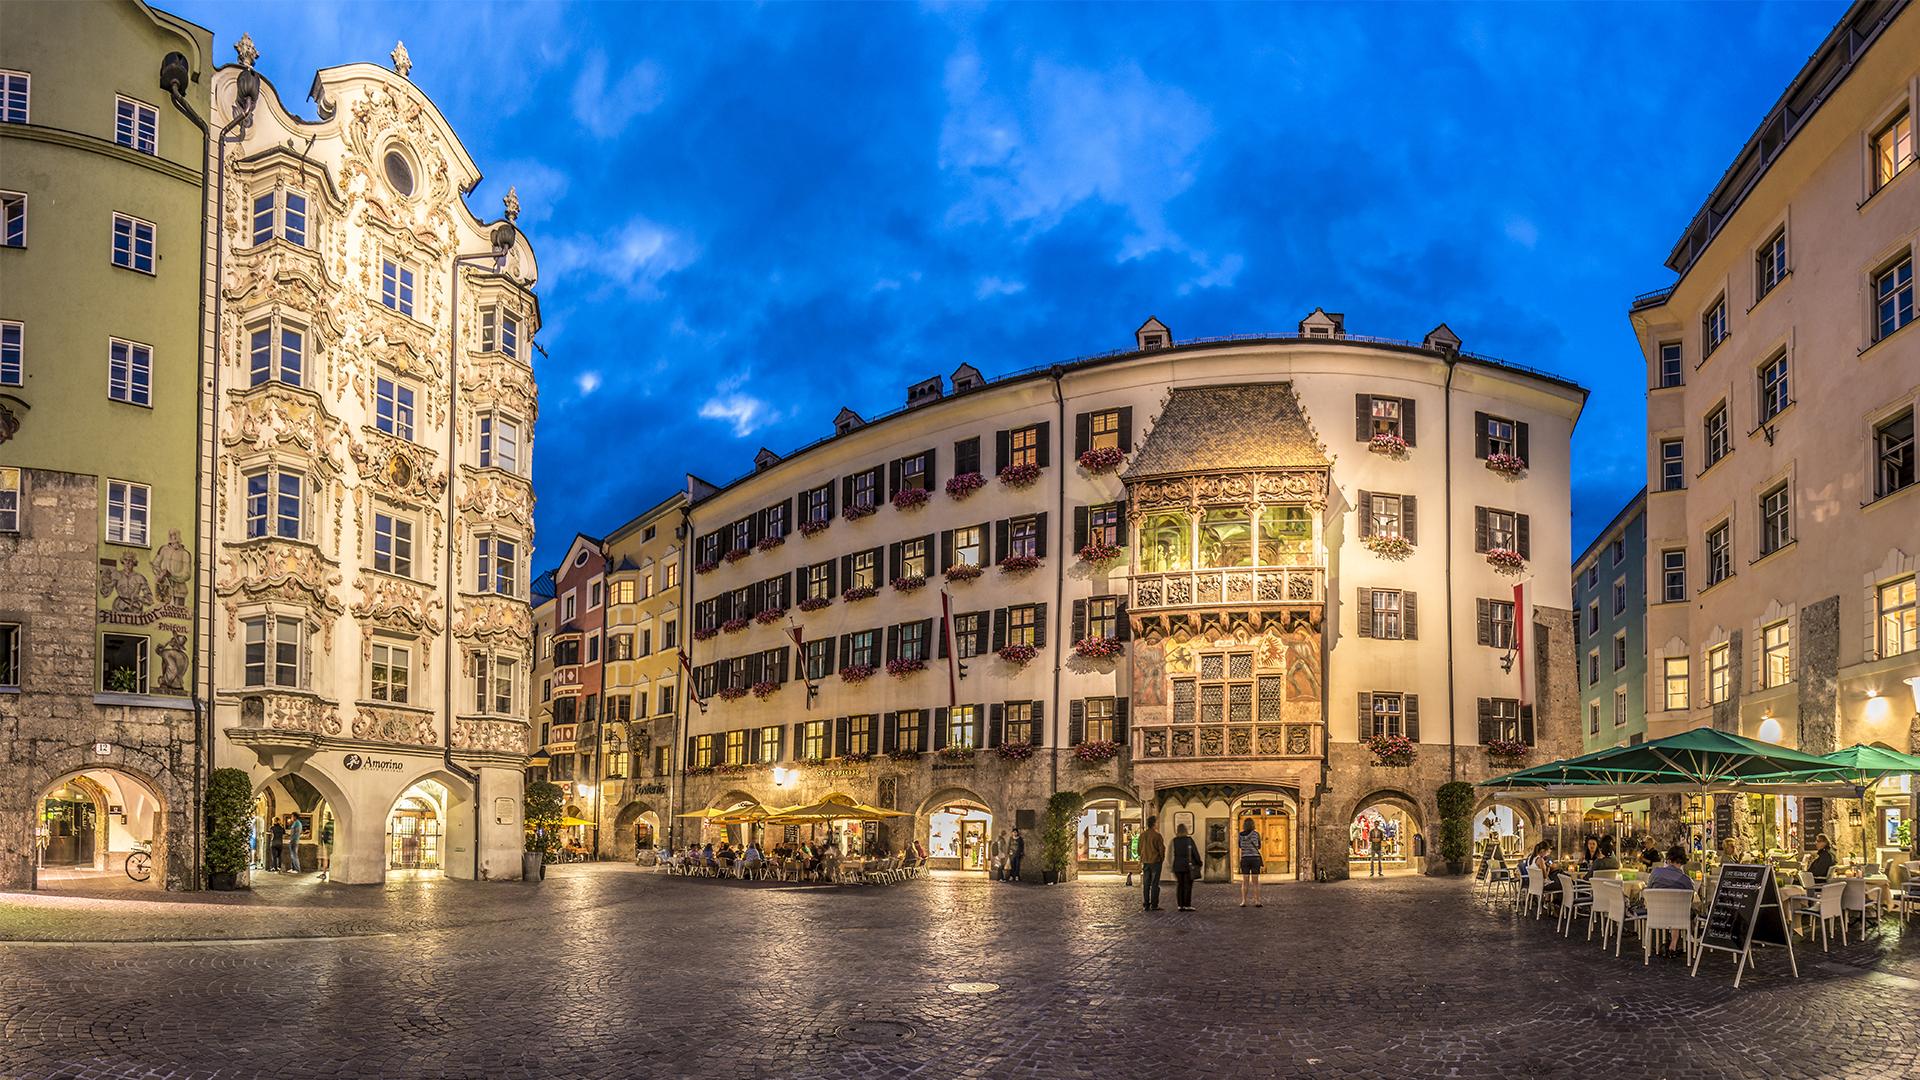 1_Österreich_Innsbruck_Golden_Roof_16_9